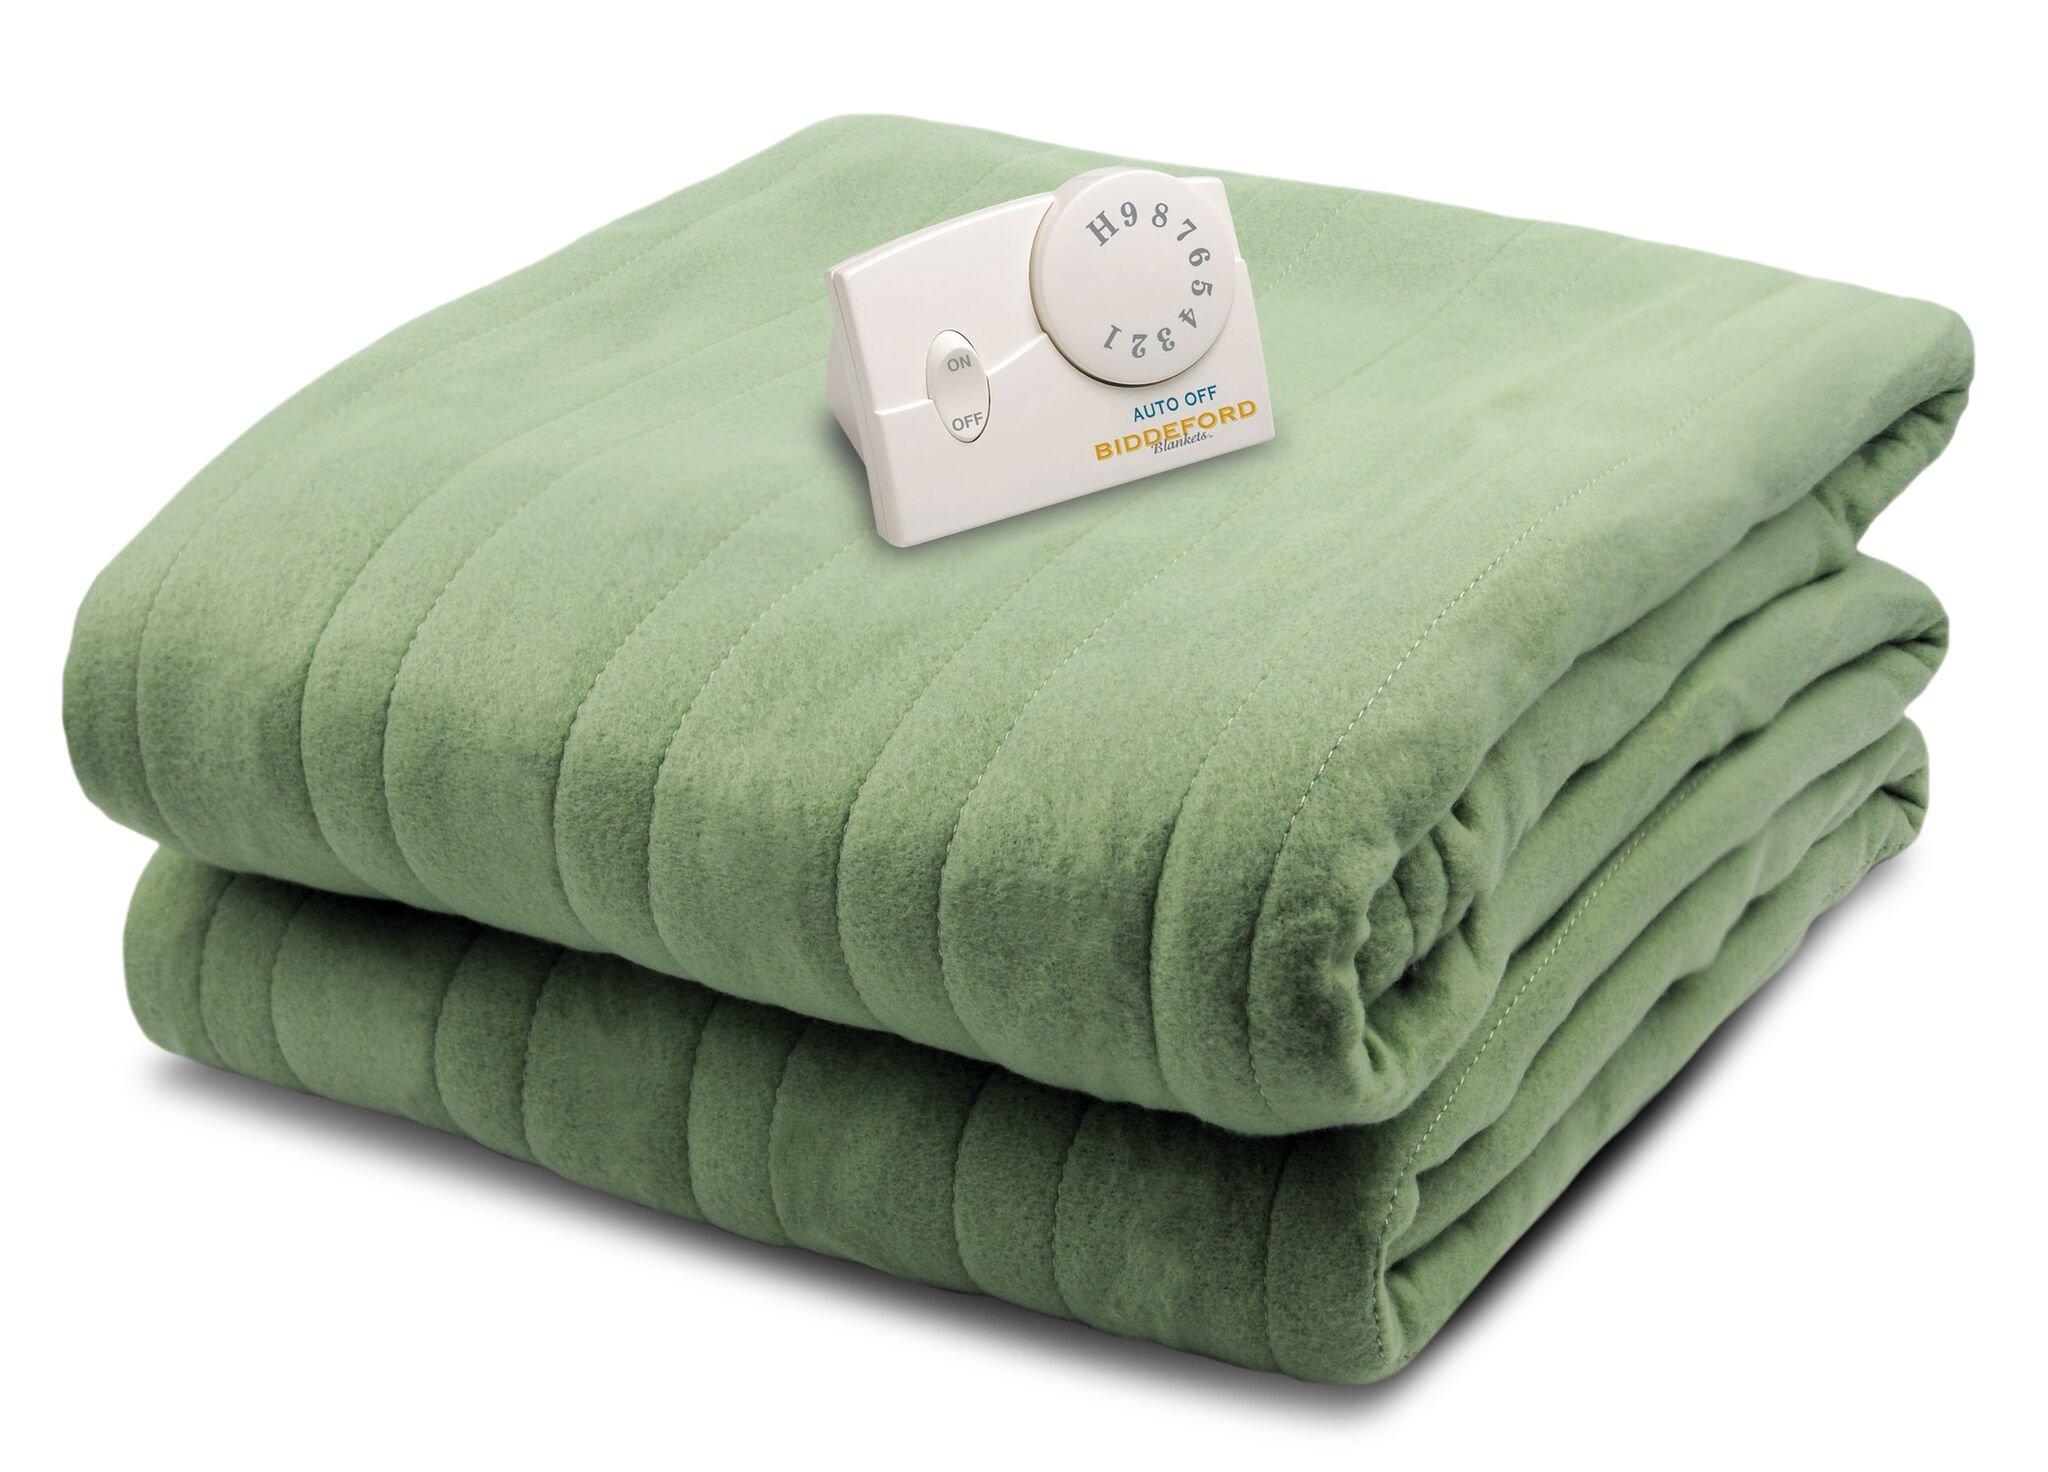 Biddeford Blankets Comfort Knit Heated Blanket, Full, Sage